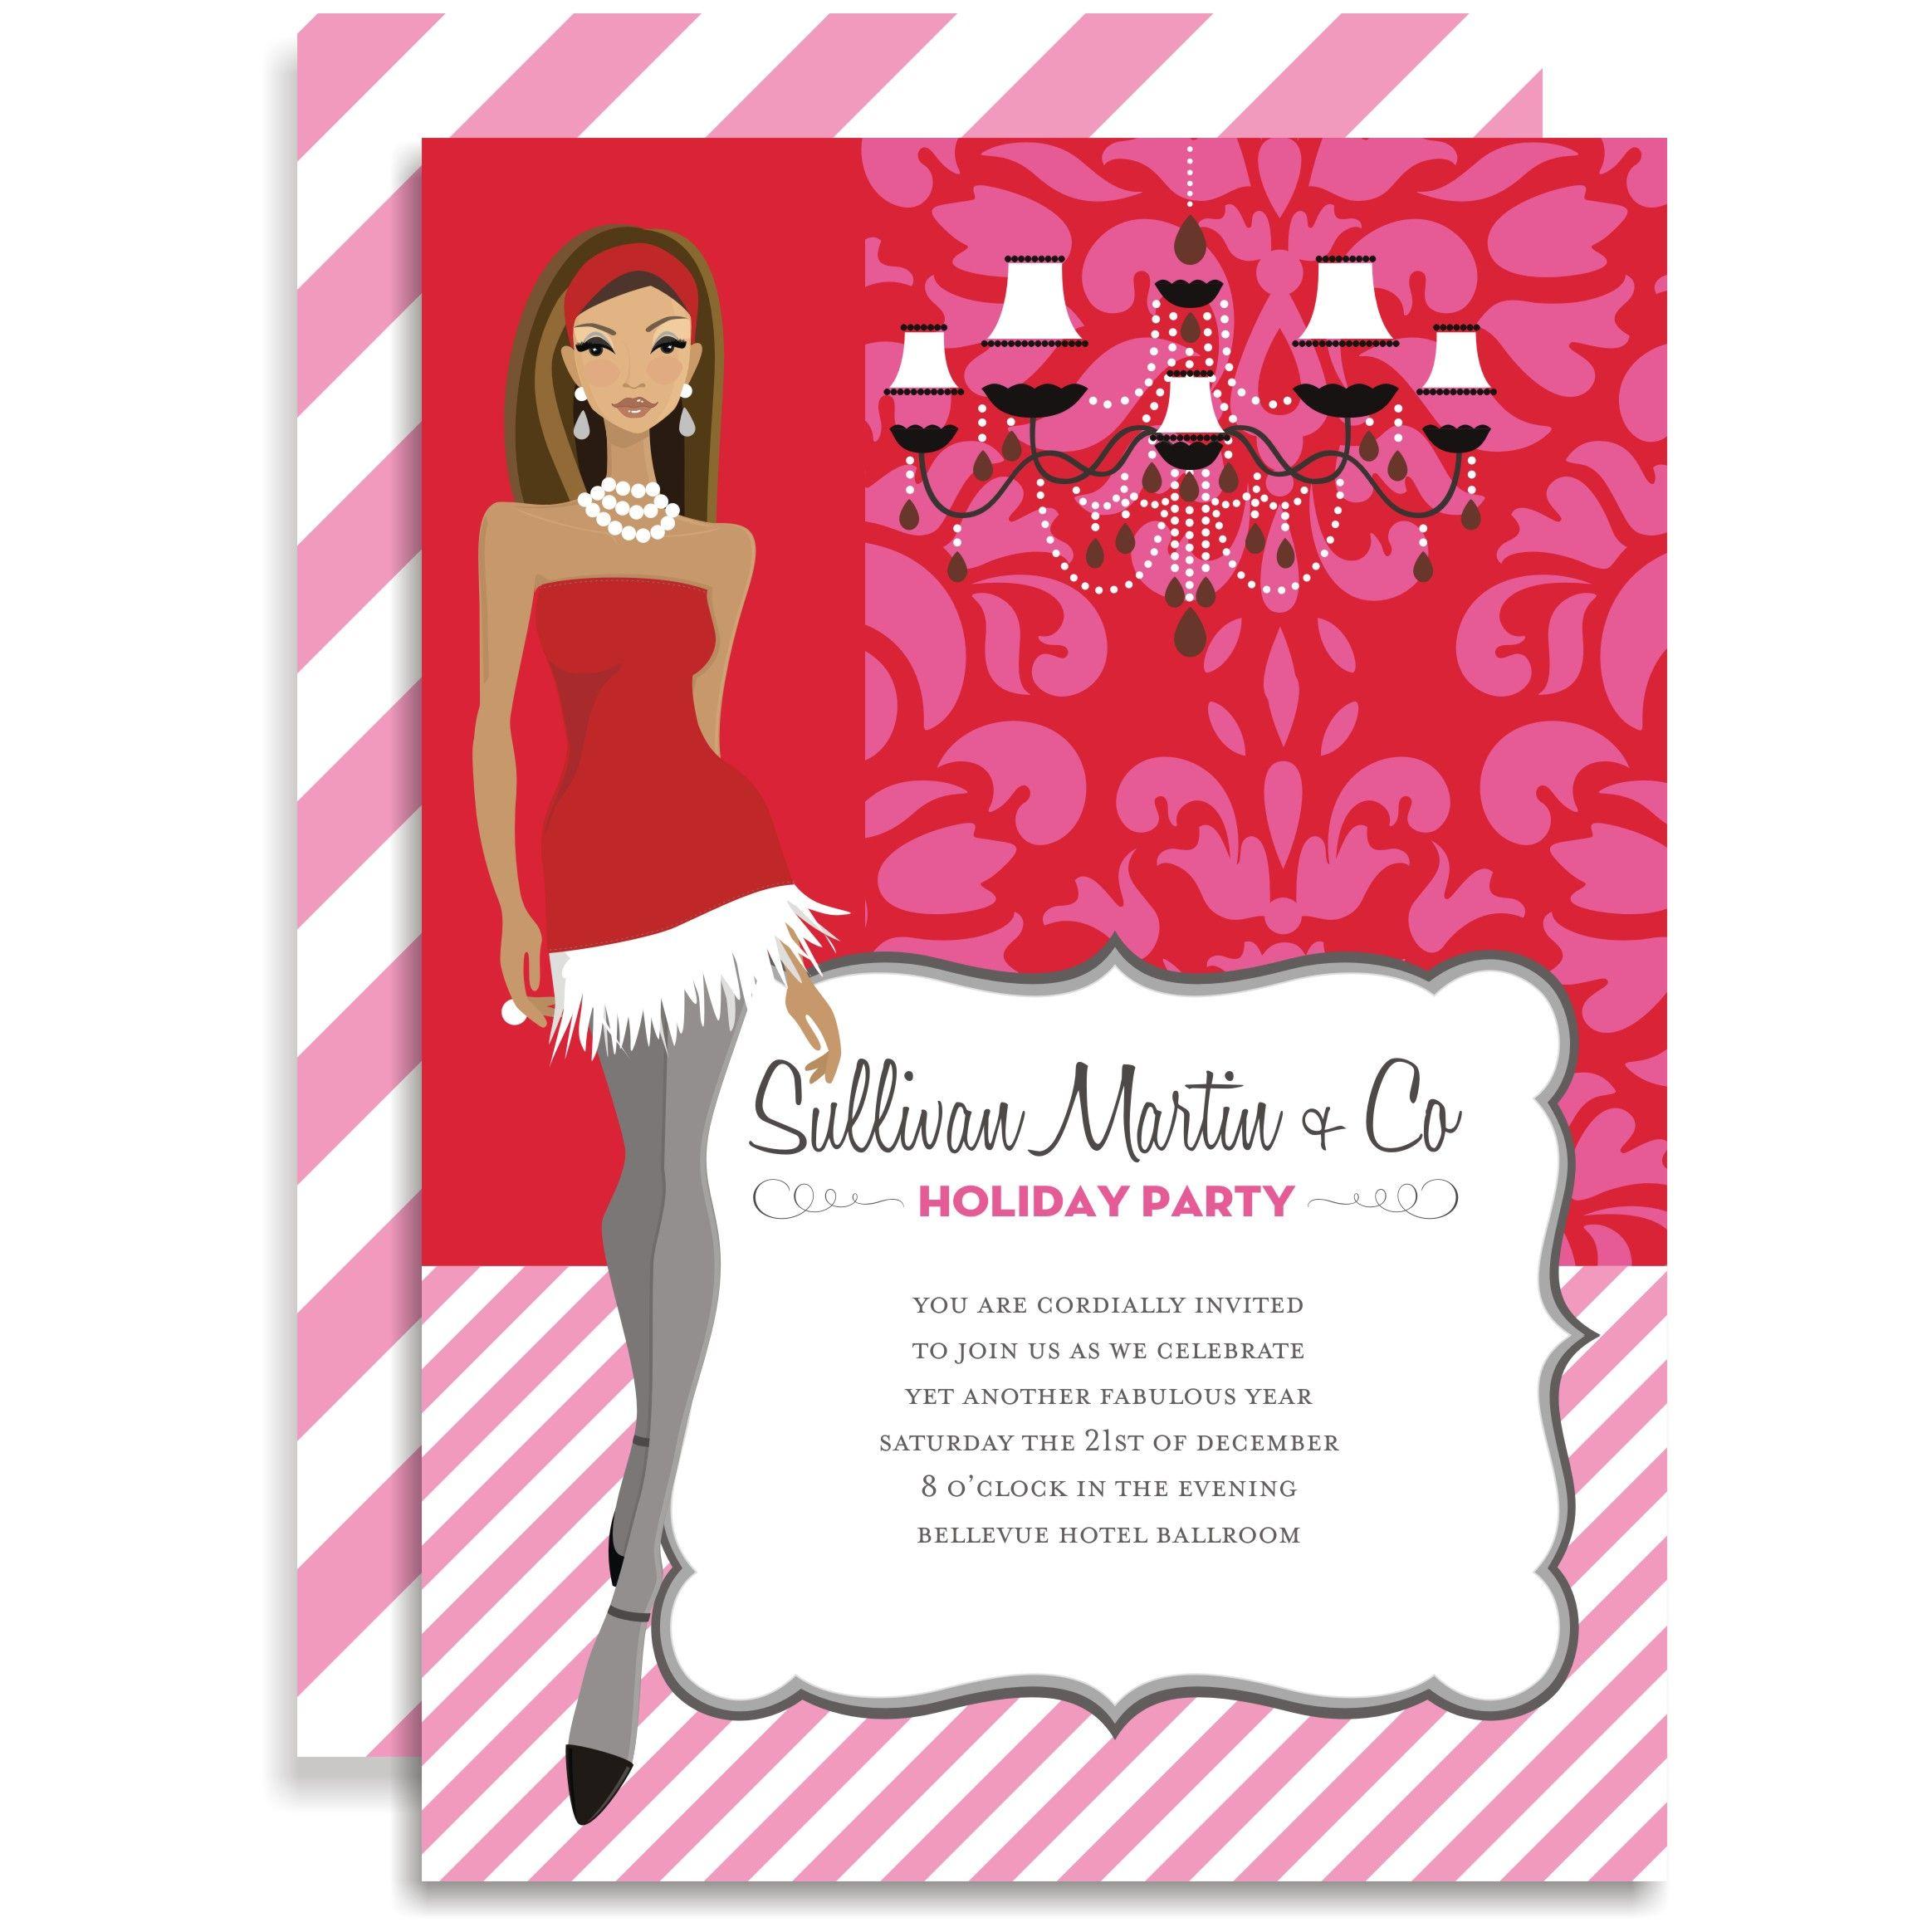 new holiday invitations - Doc Milo: Wedding & Bridal Invitations ...